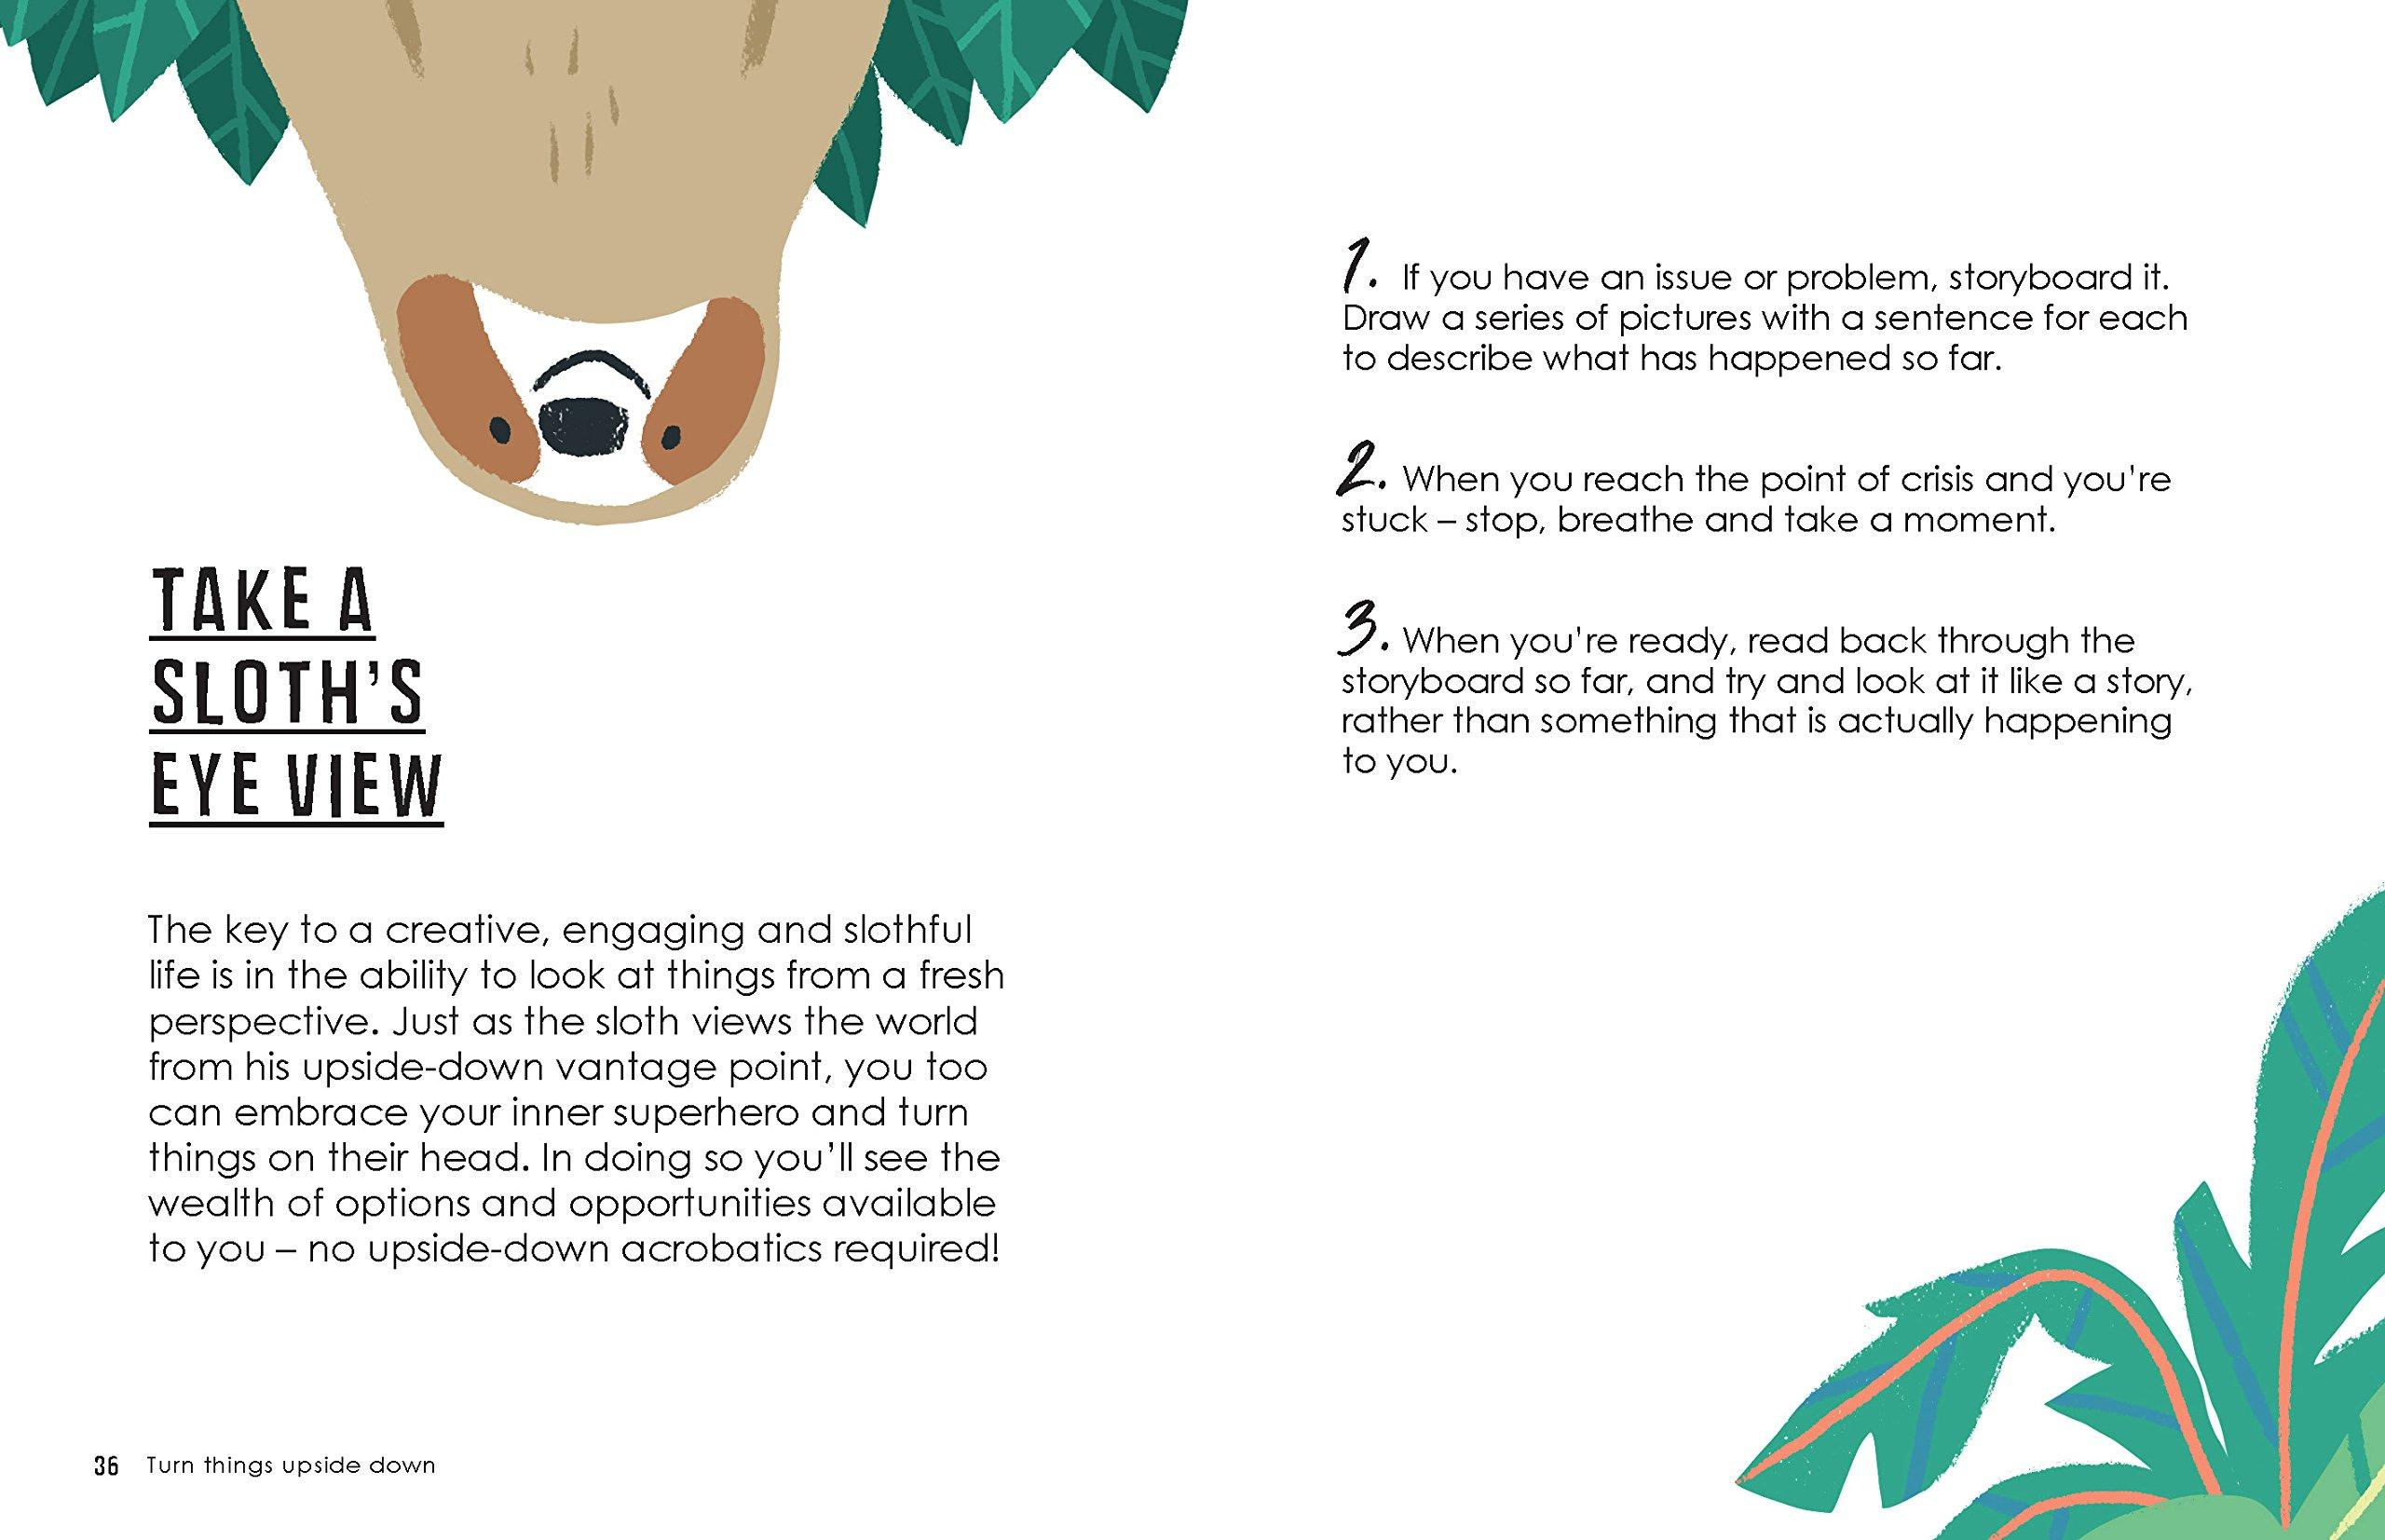 2278feedb Be More Sloth: Get the Hang of Living Life in the Slow Lane: Alison Davies,  Carolina Buzio: 9781787132276: Amazon.com: Books